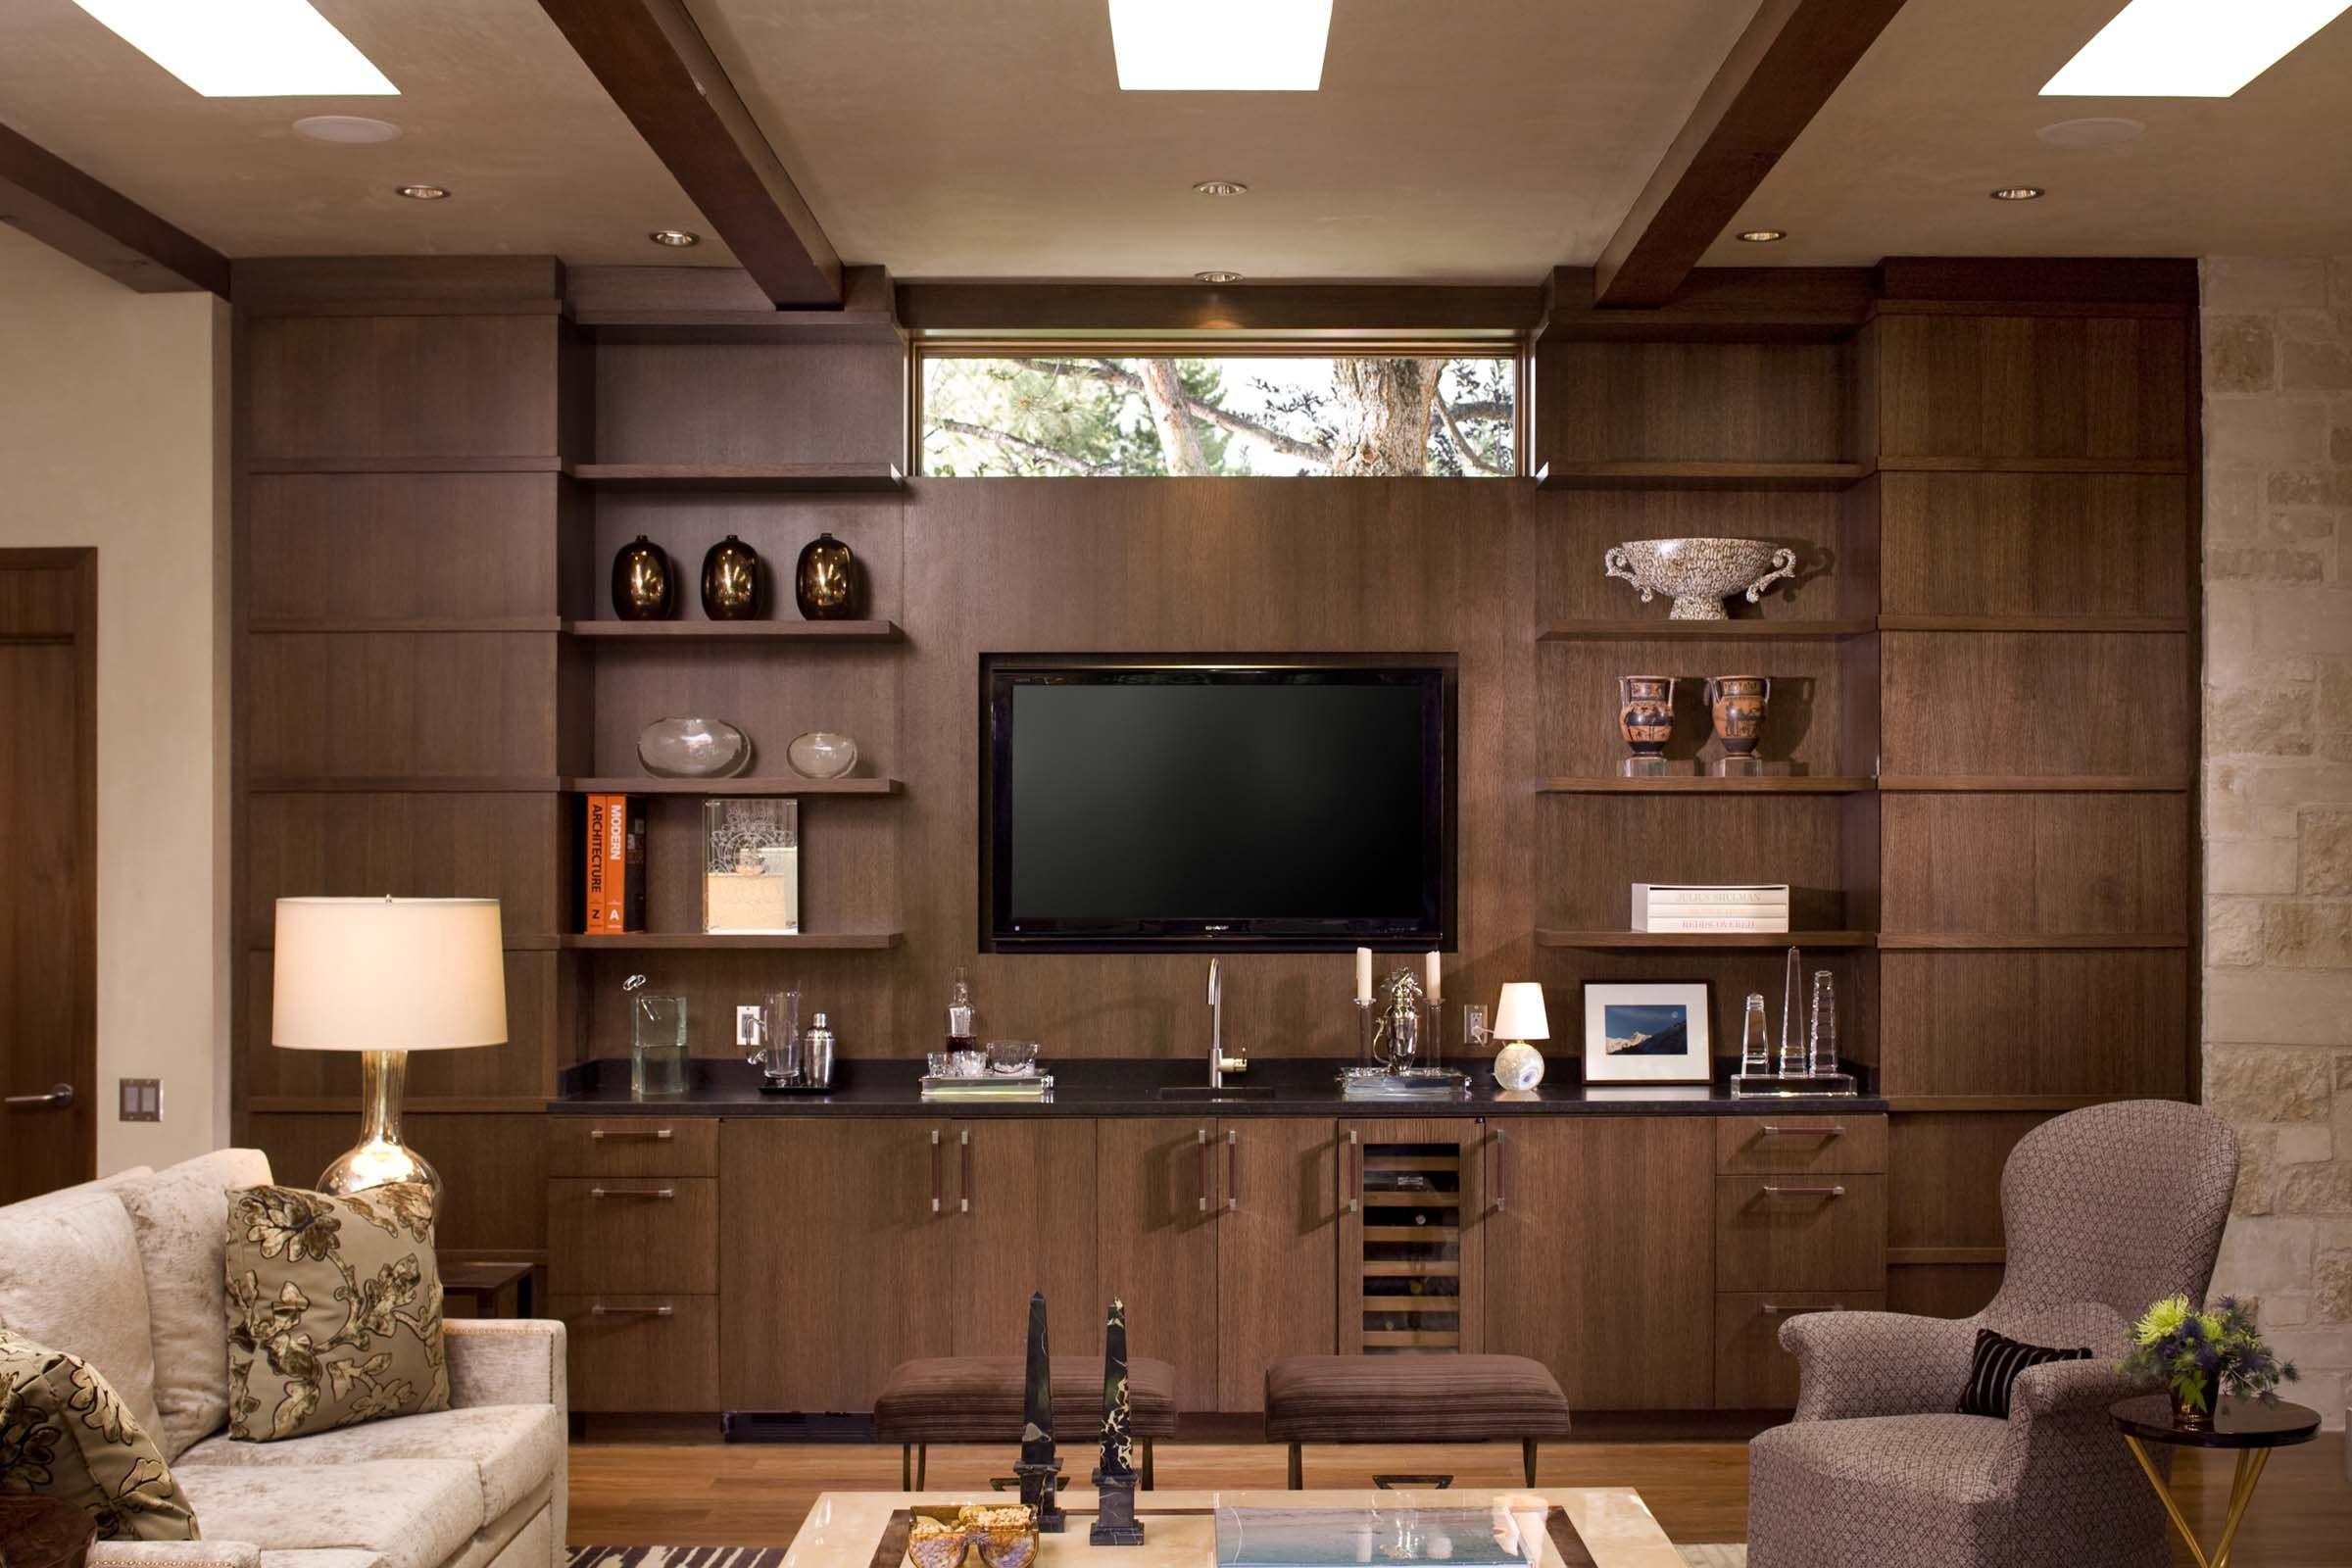 Living Room Cabinet Design Ideas Amusing Hogyan Használhatod Ki Kis Méretű Nappalid Maximálisan  Home Design Inspiration